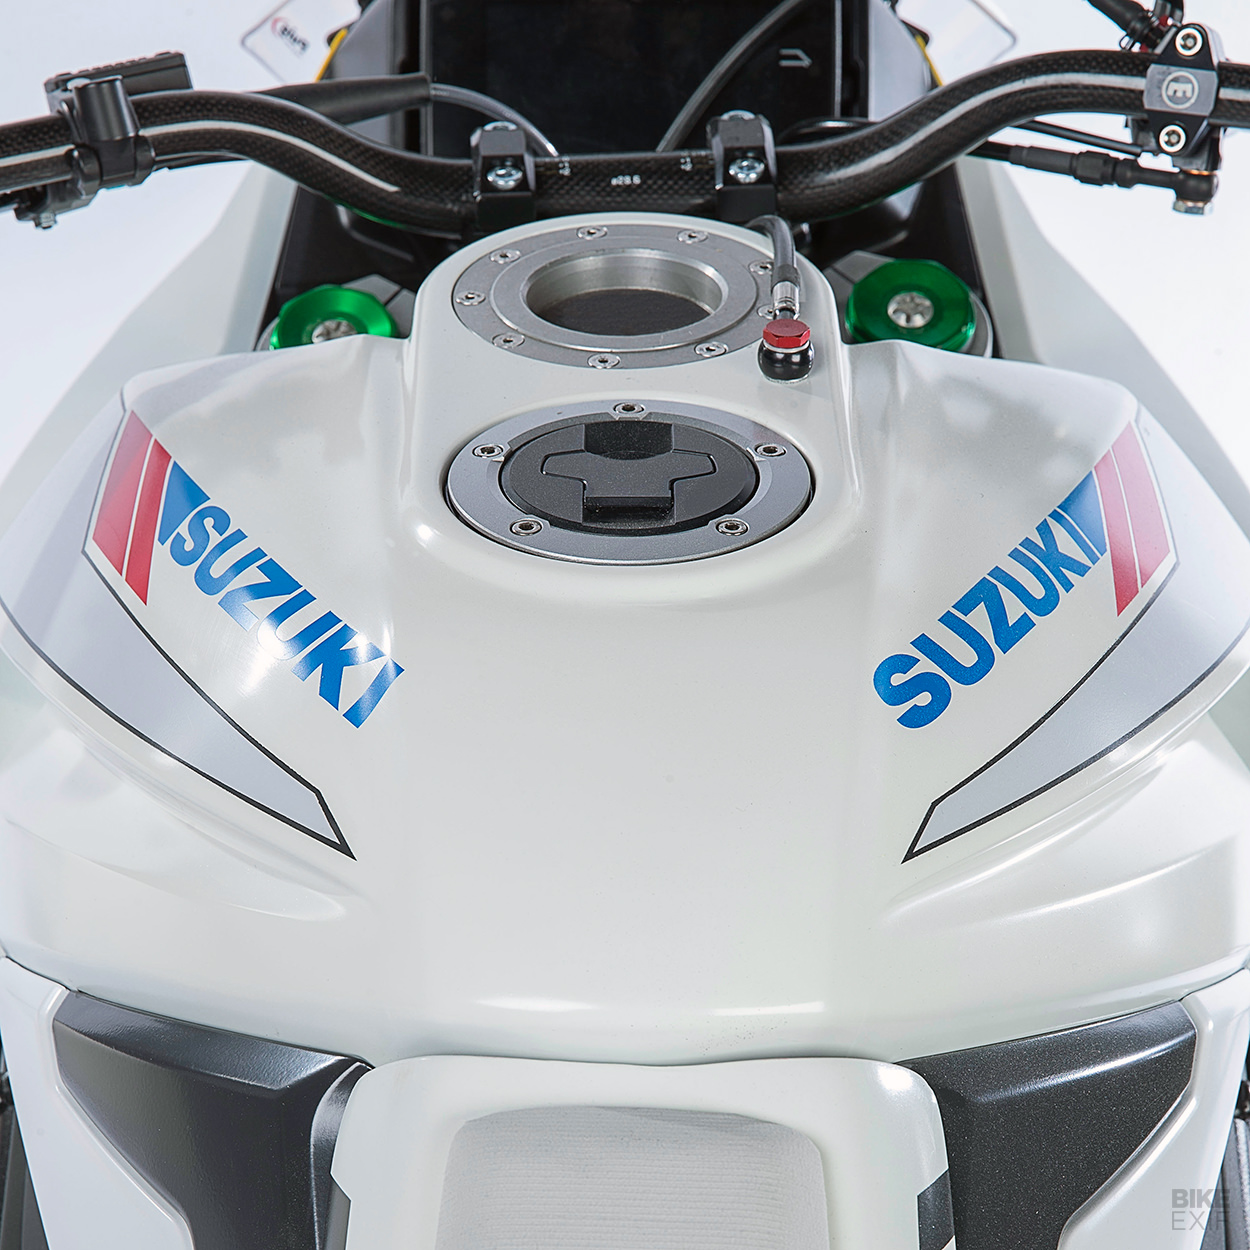 Custom 2020 Suzuki Katana by ICON